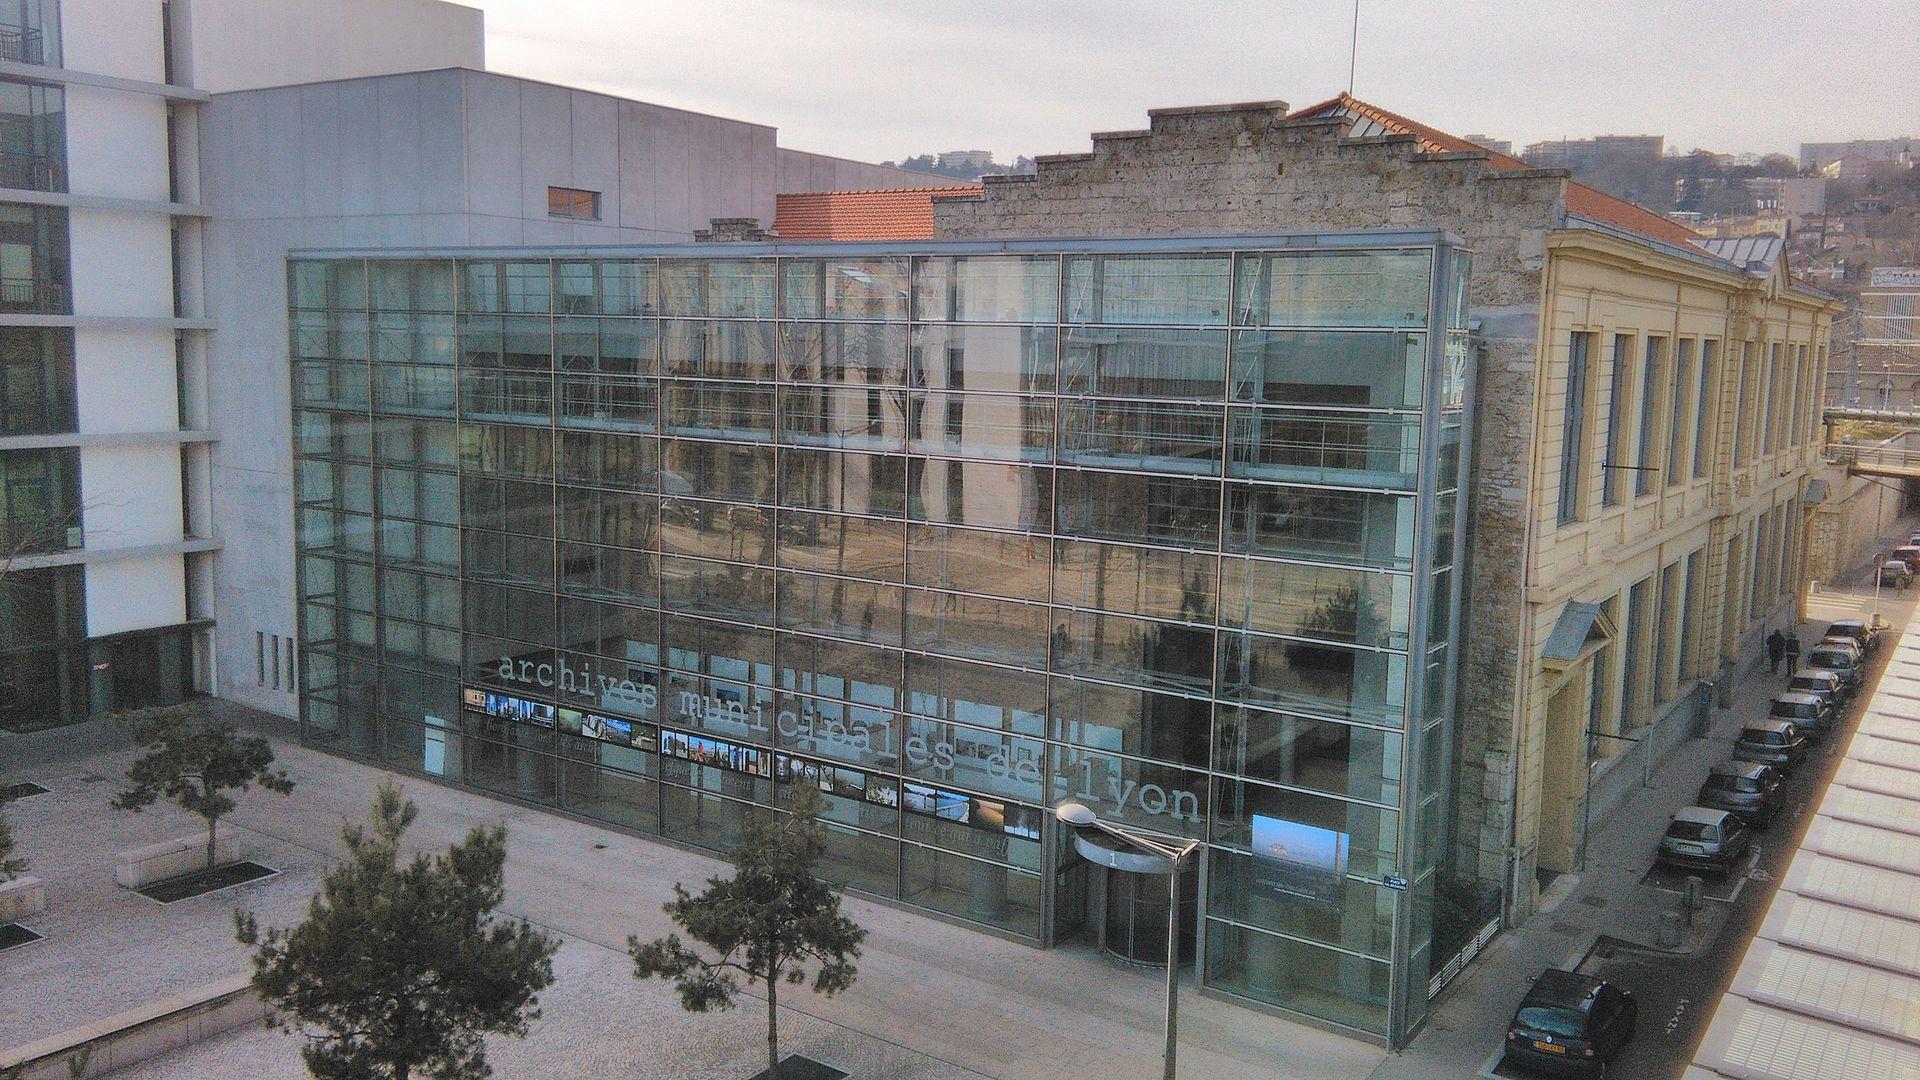 Archives Municipales De Lyon  U2014 Wikip U00e9dia